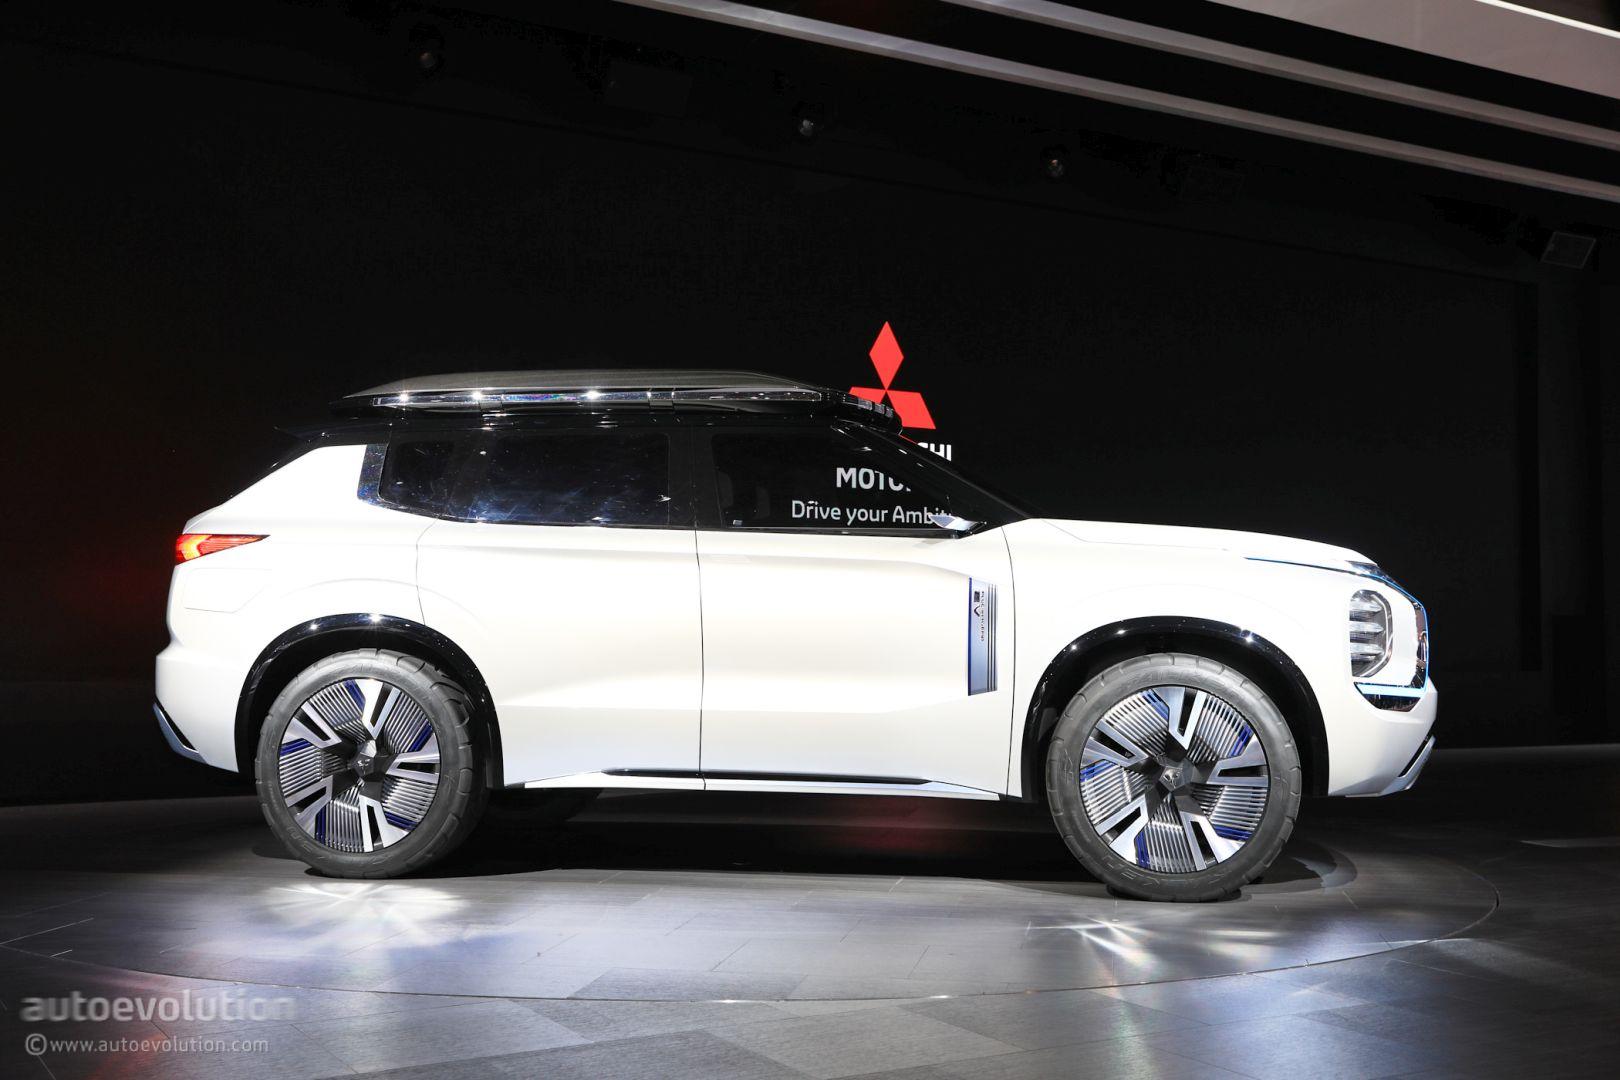 2021 mitsubishi outlander rendering reveals futuristic